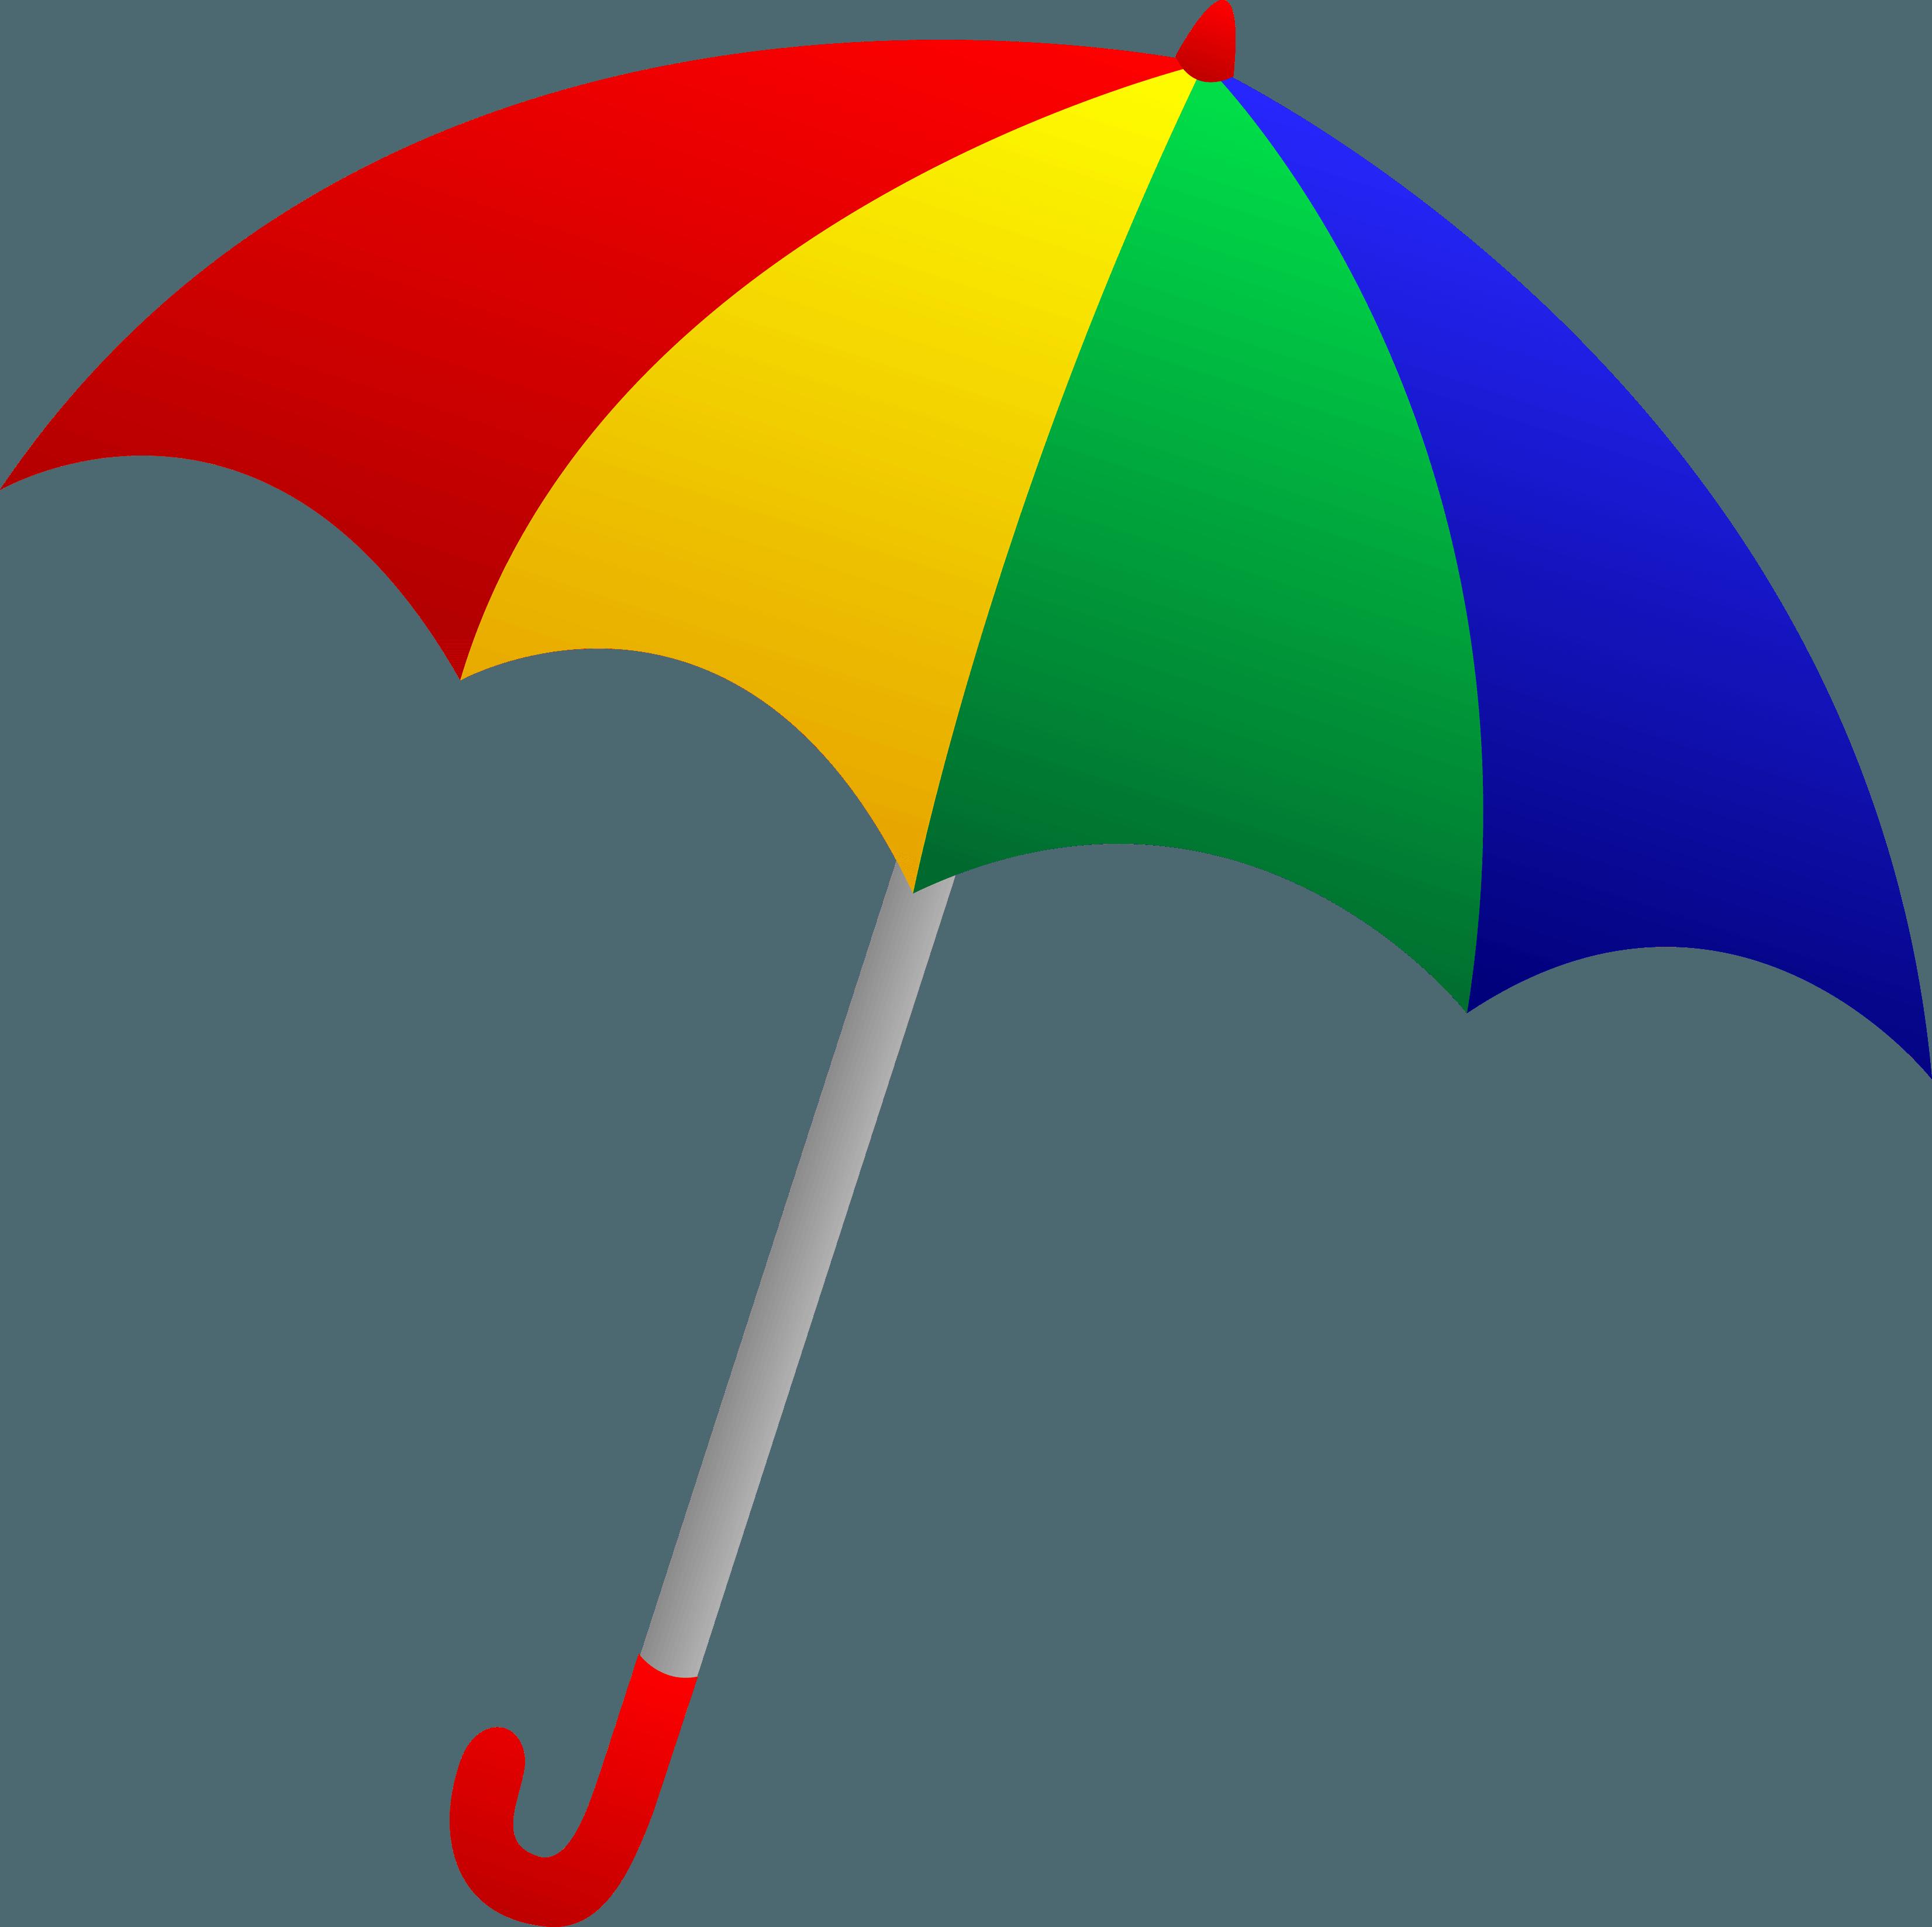 Clipart rainbow preschool. Umbrella pre school international